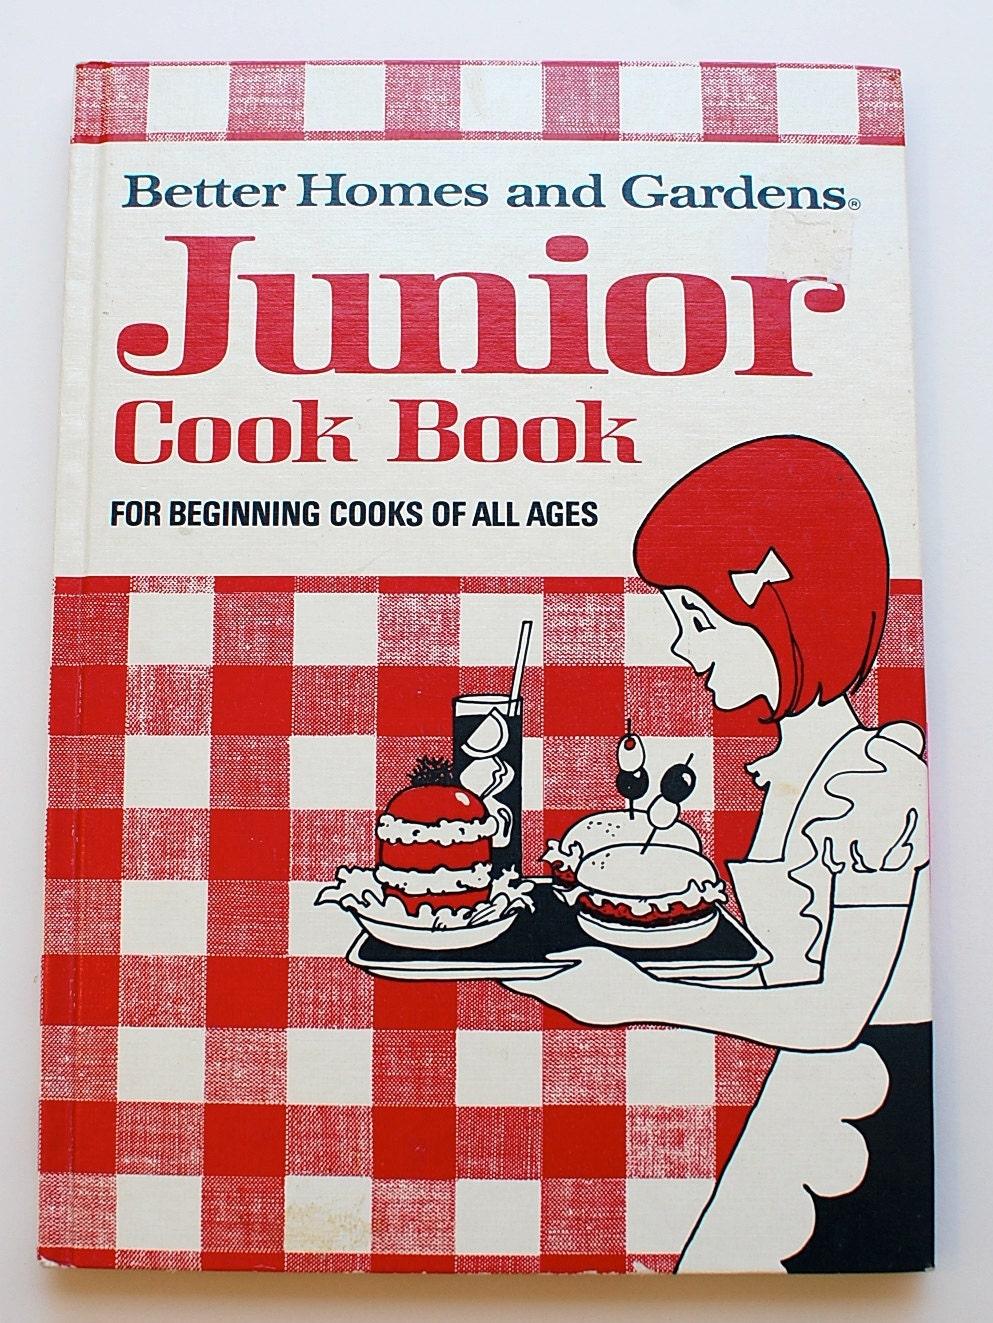 Better Homes And Gardens Junior Cookbook 1972 Vintage Children